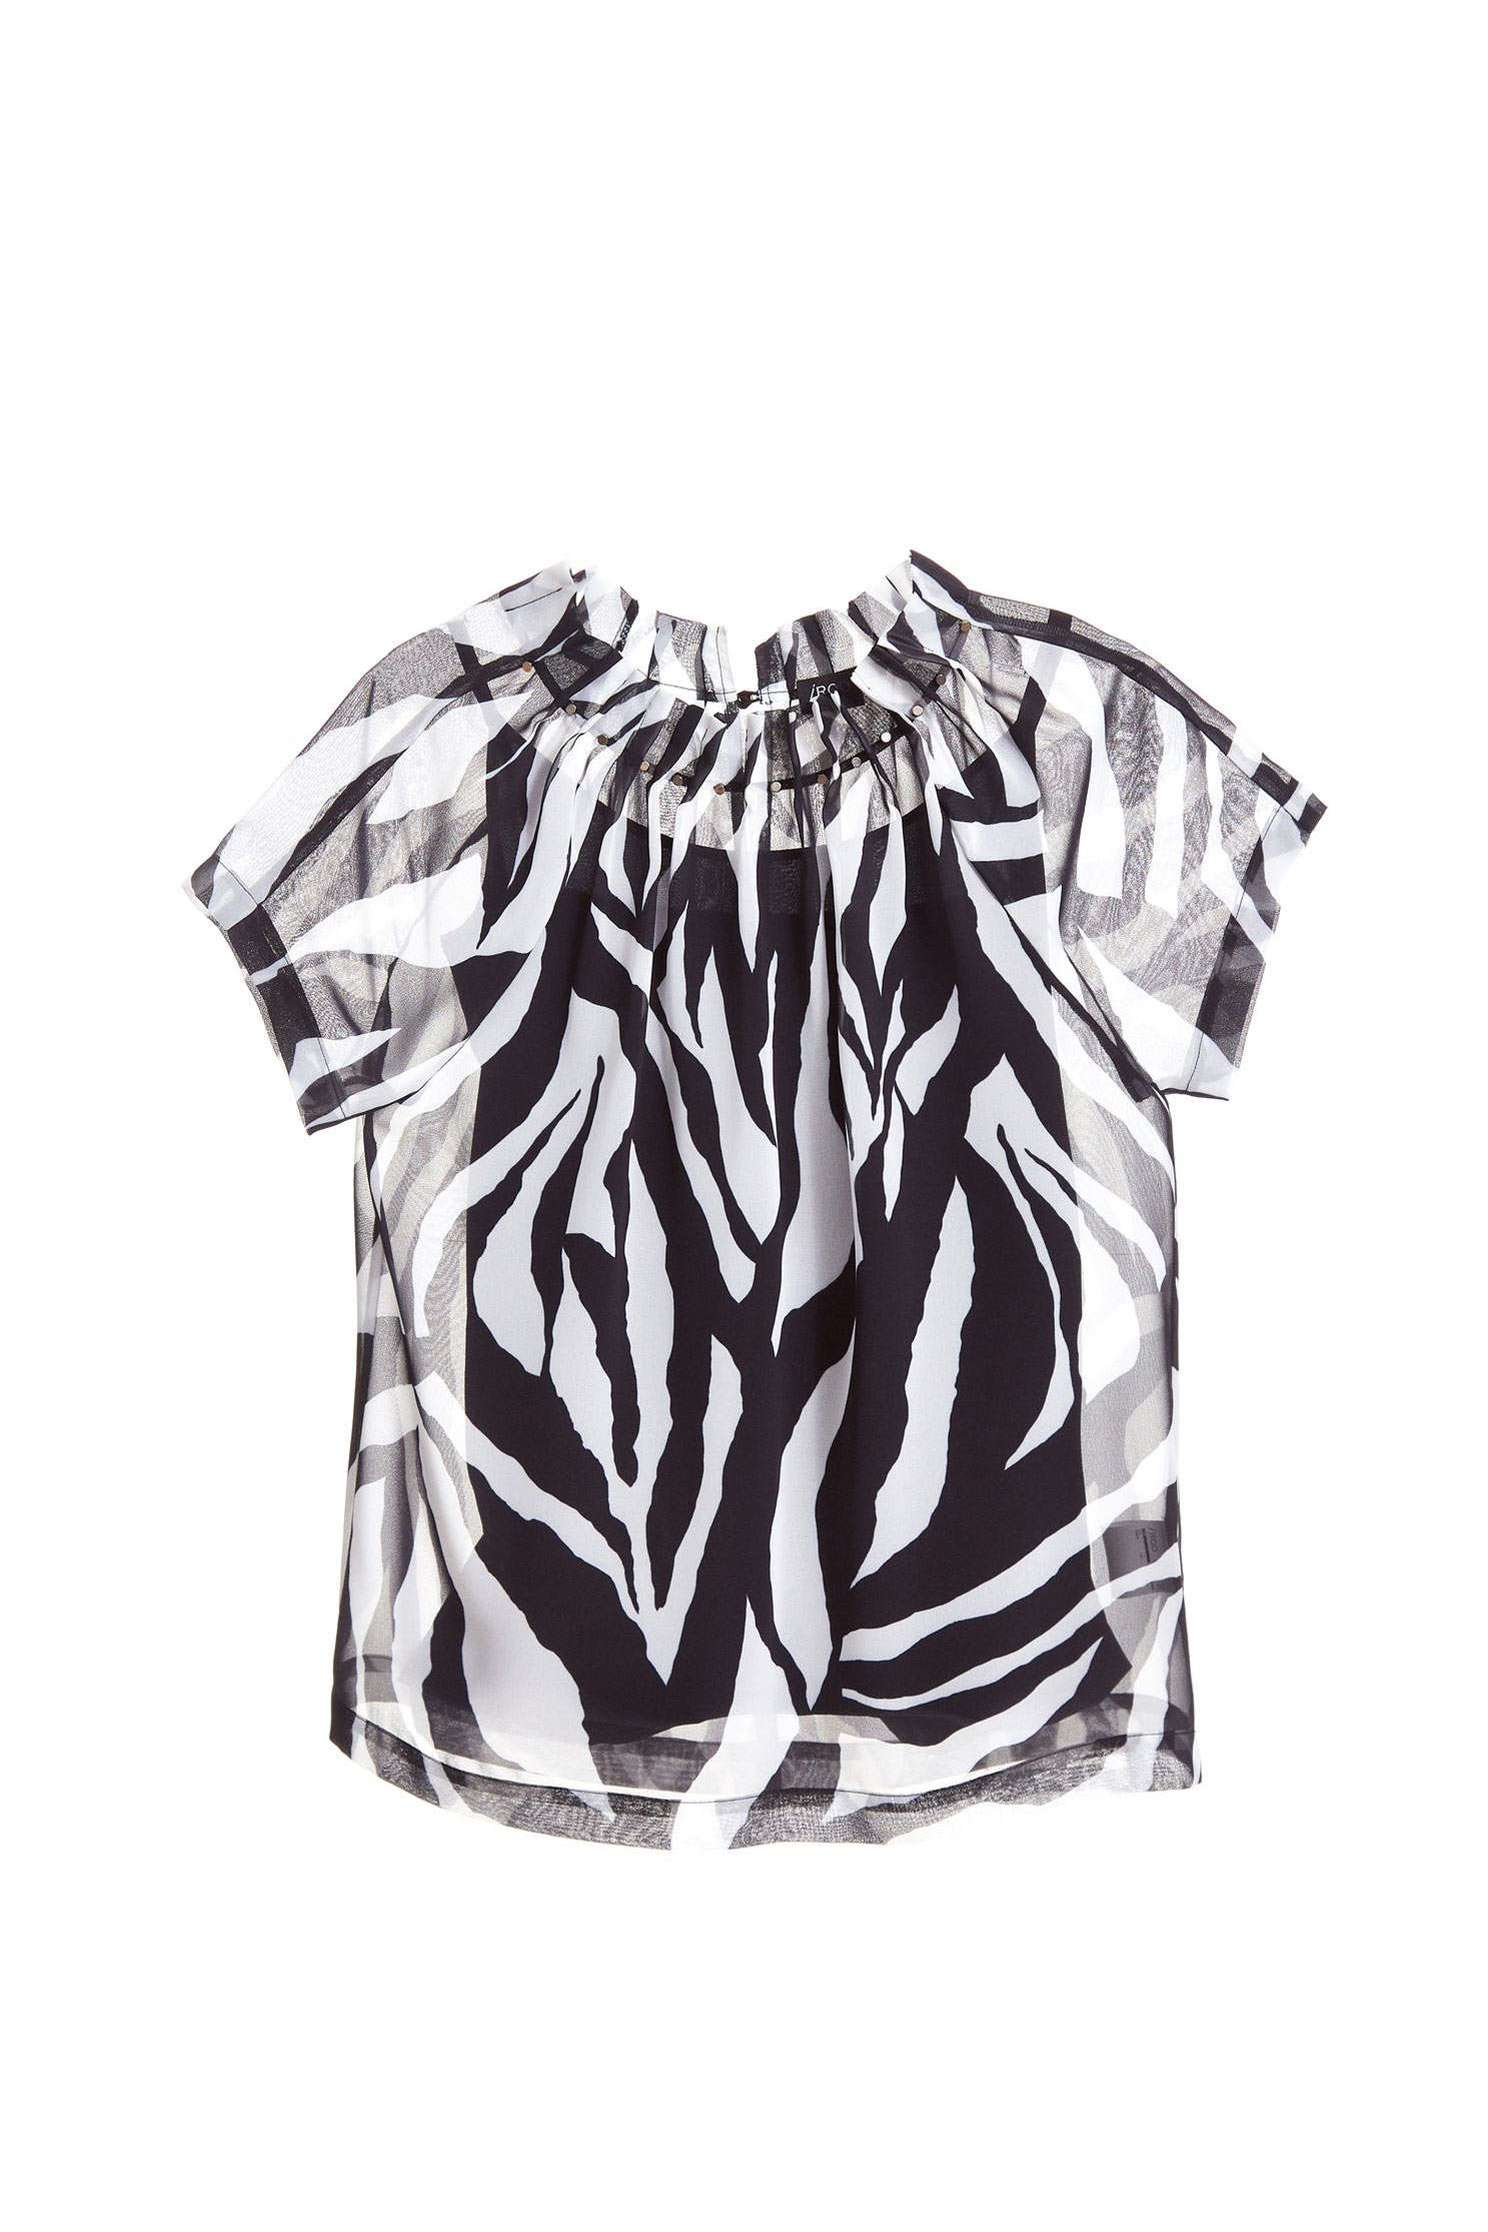 Zebra stripe classic fashion top